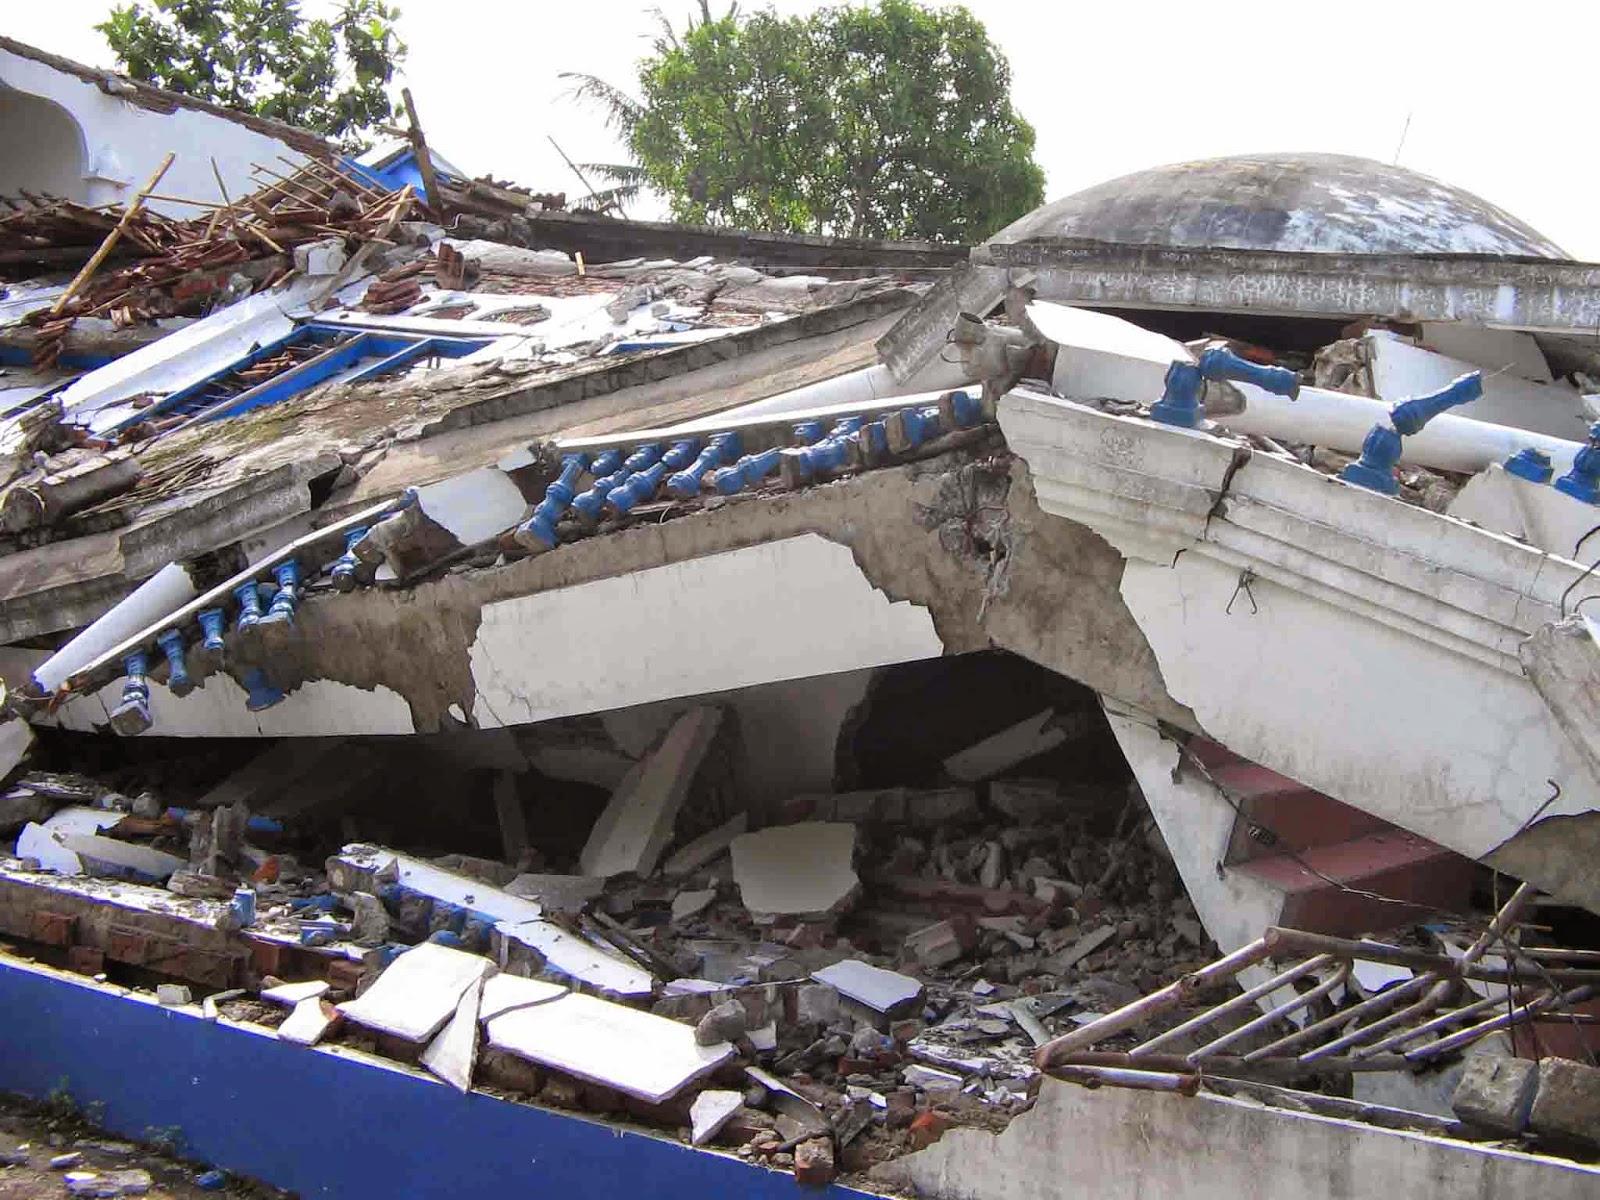 Contoh Teks Eksplanasi Gempa Bumi Bahasa Indonesia Rumah Ubur Ubur